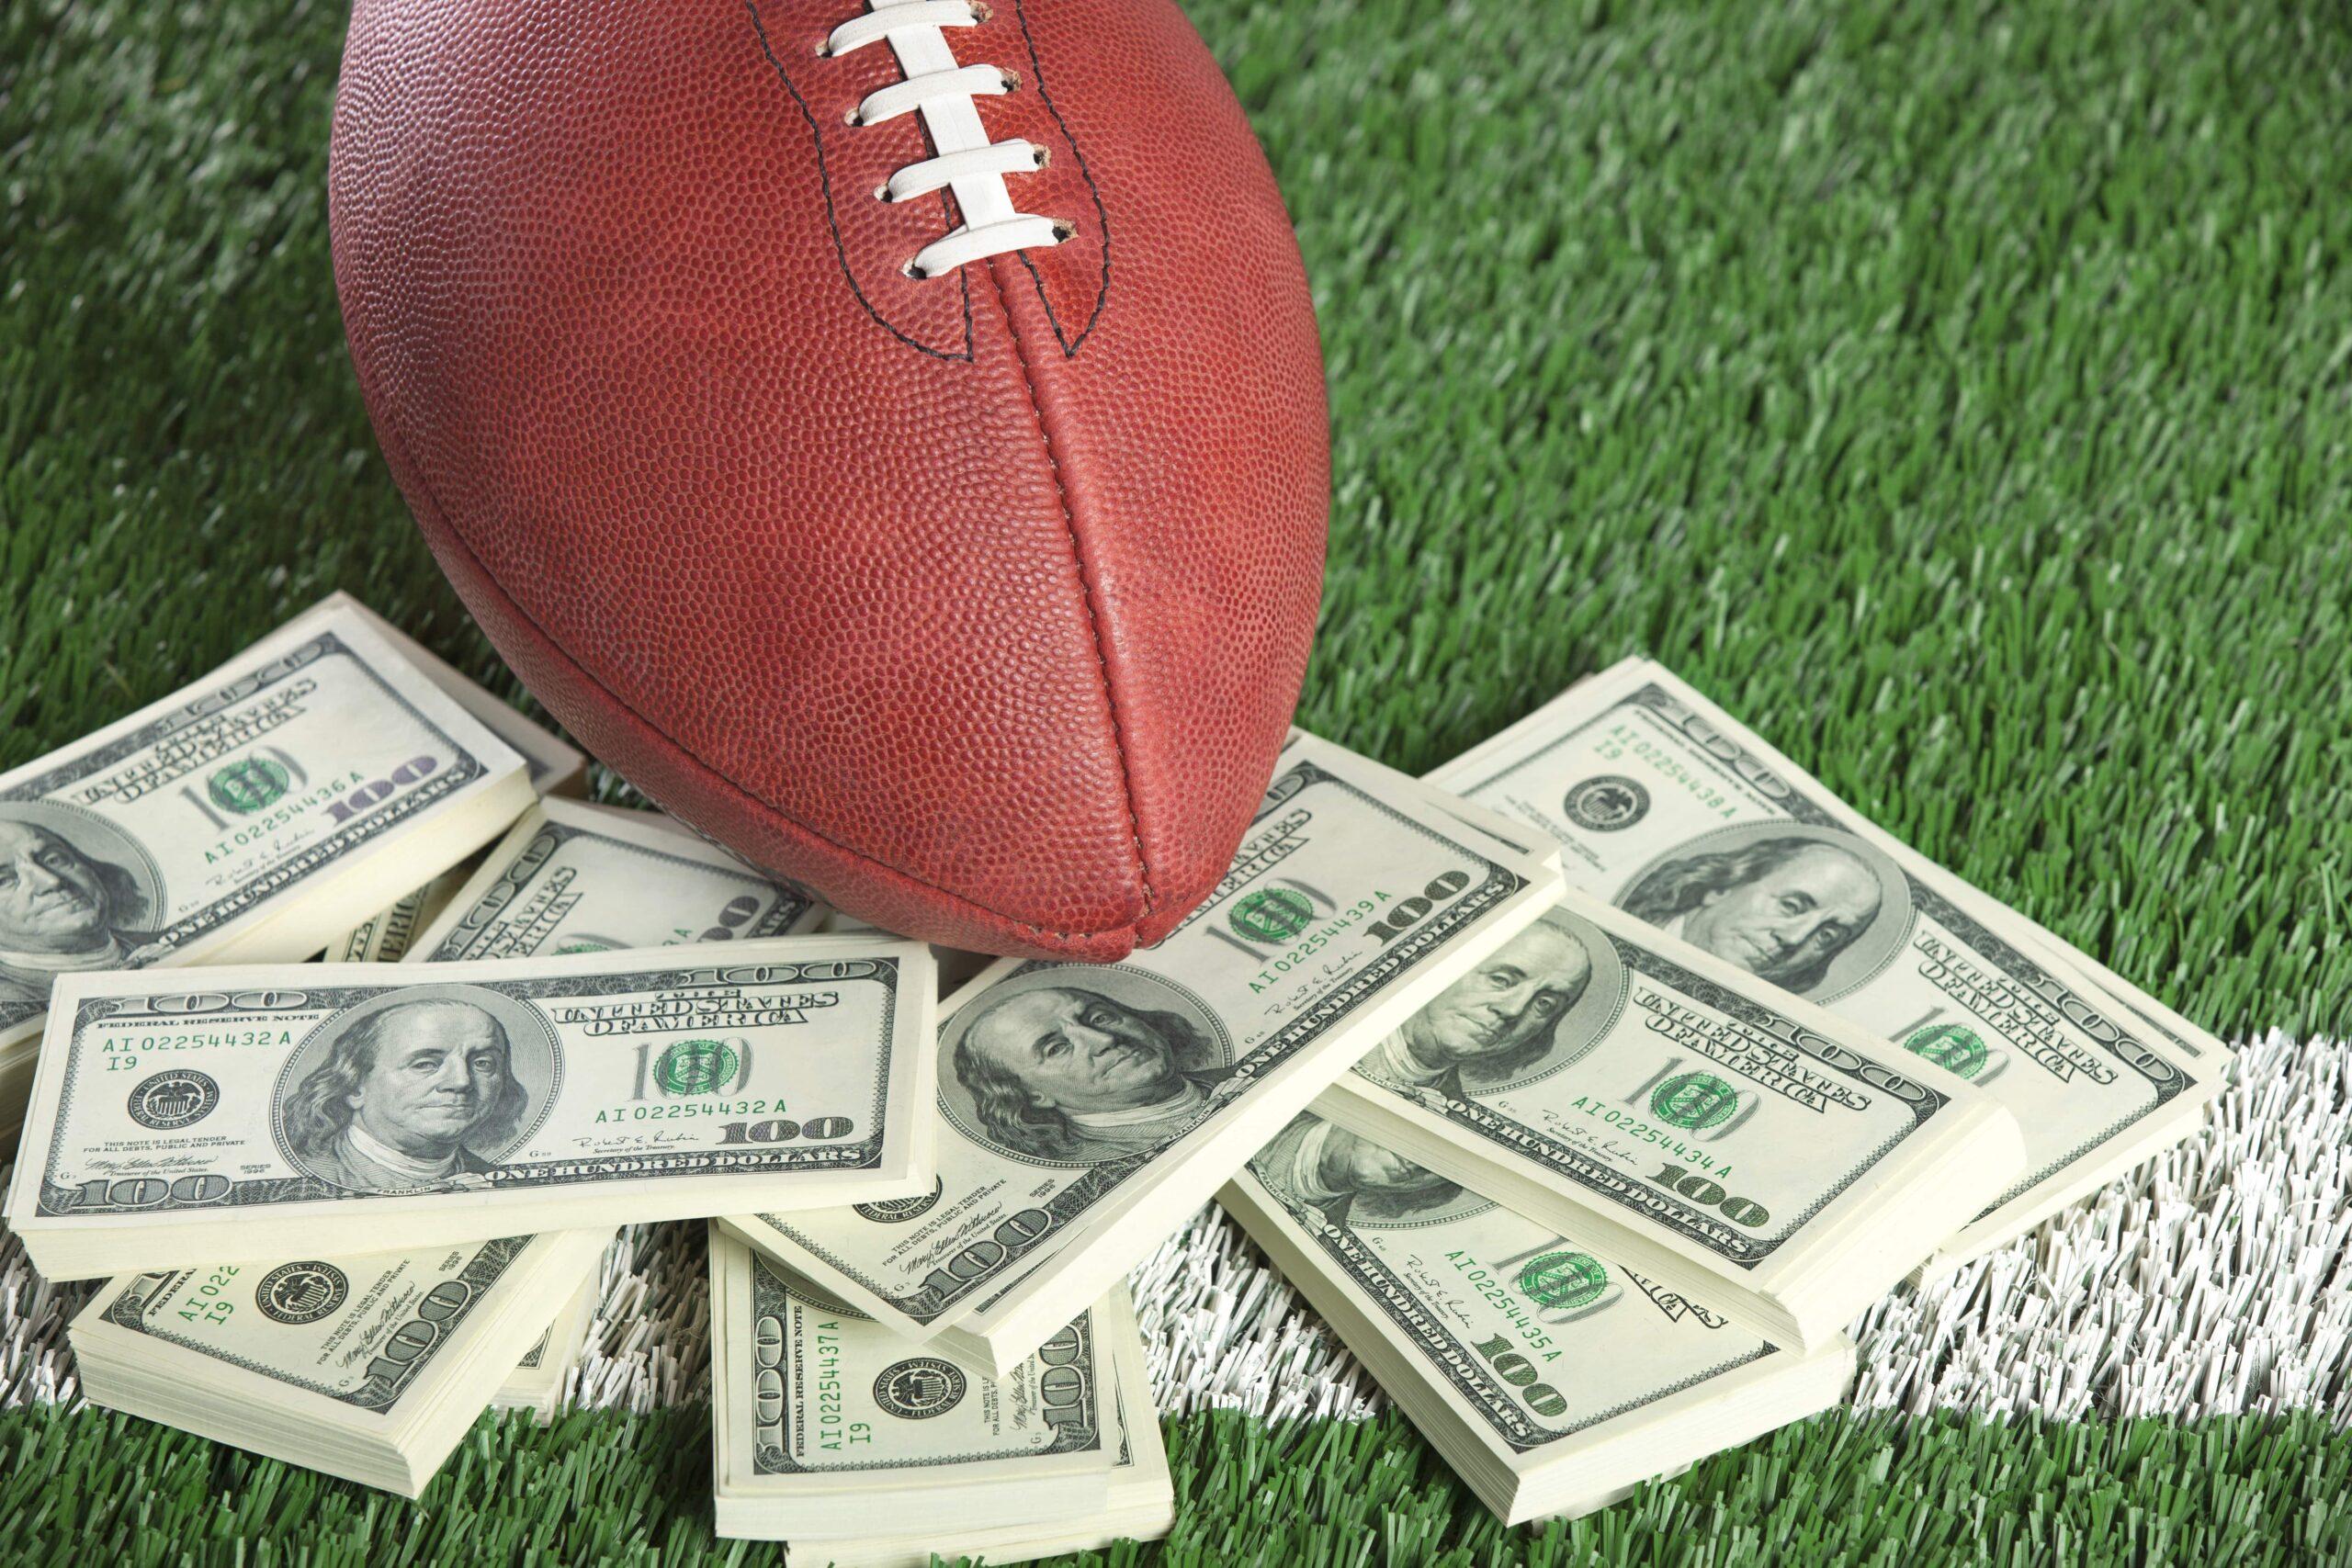 NFL online sports betting